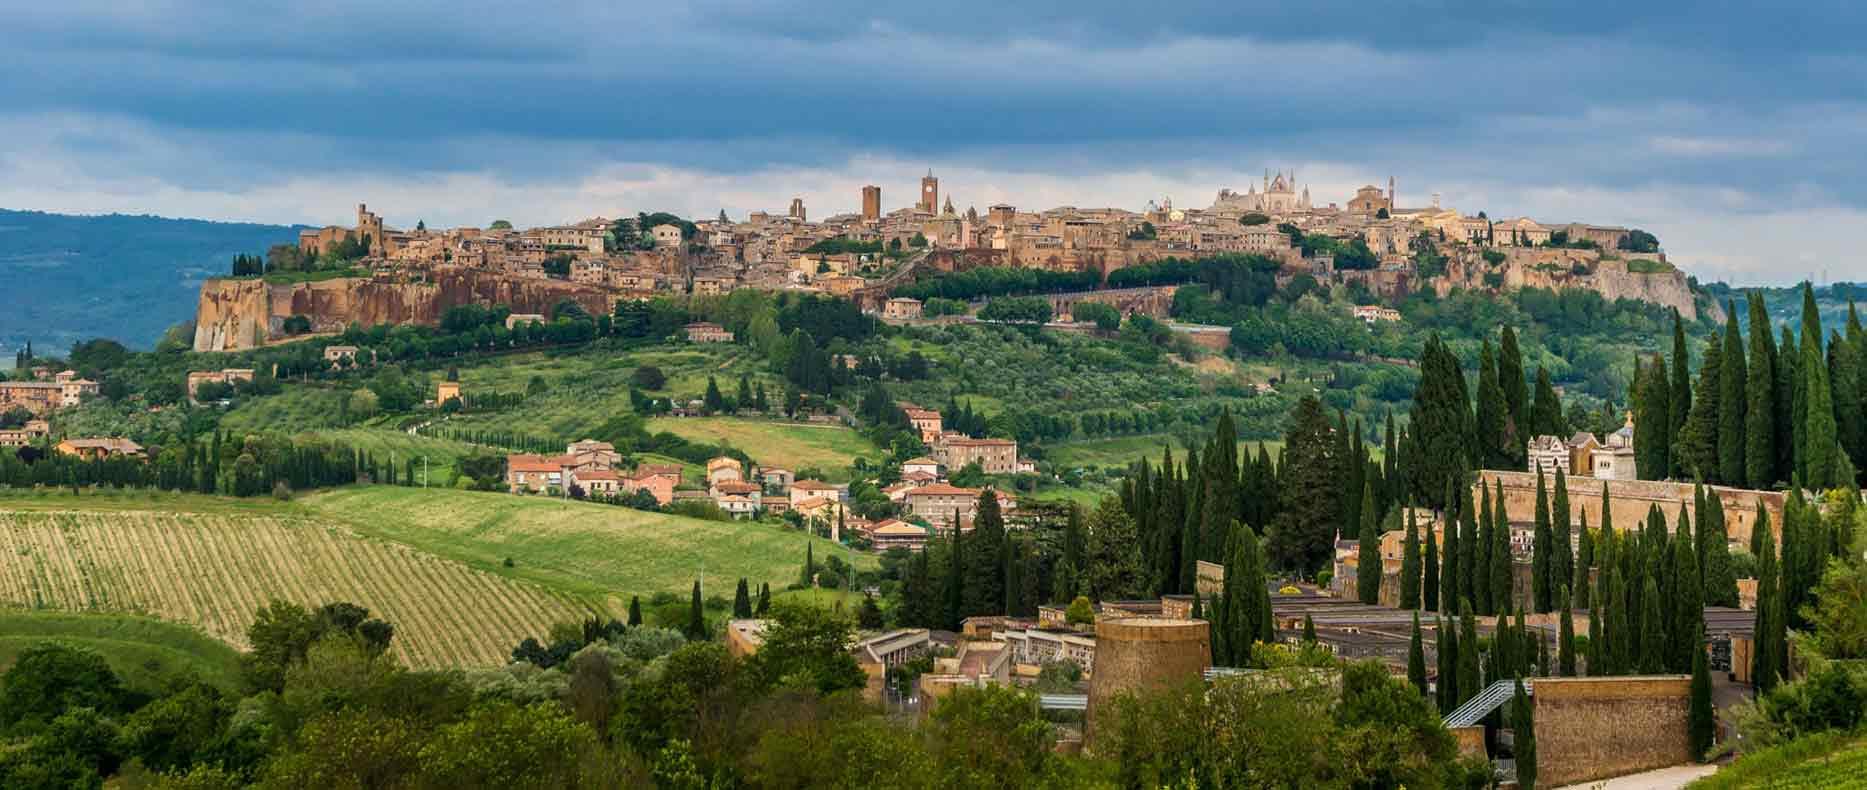 Orvieto, cidades próximas a Roma